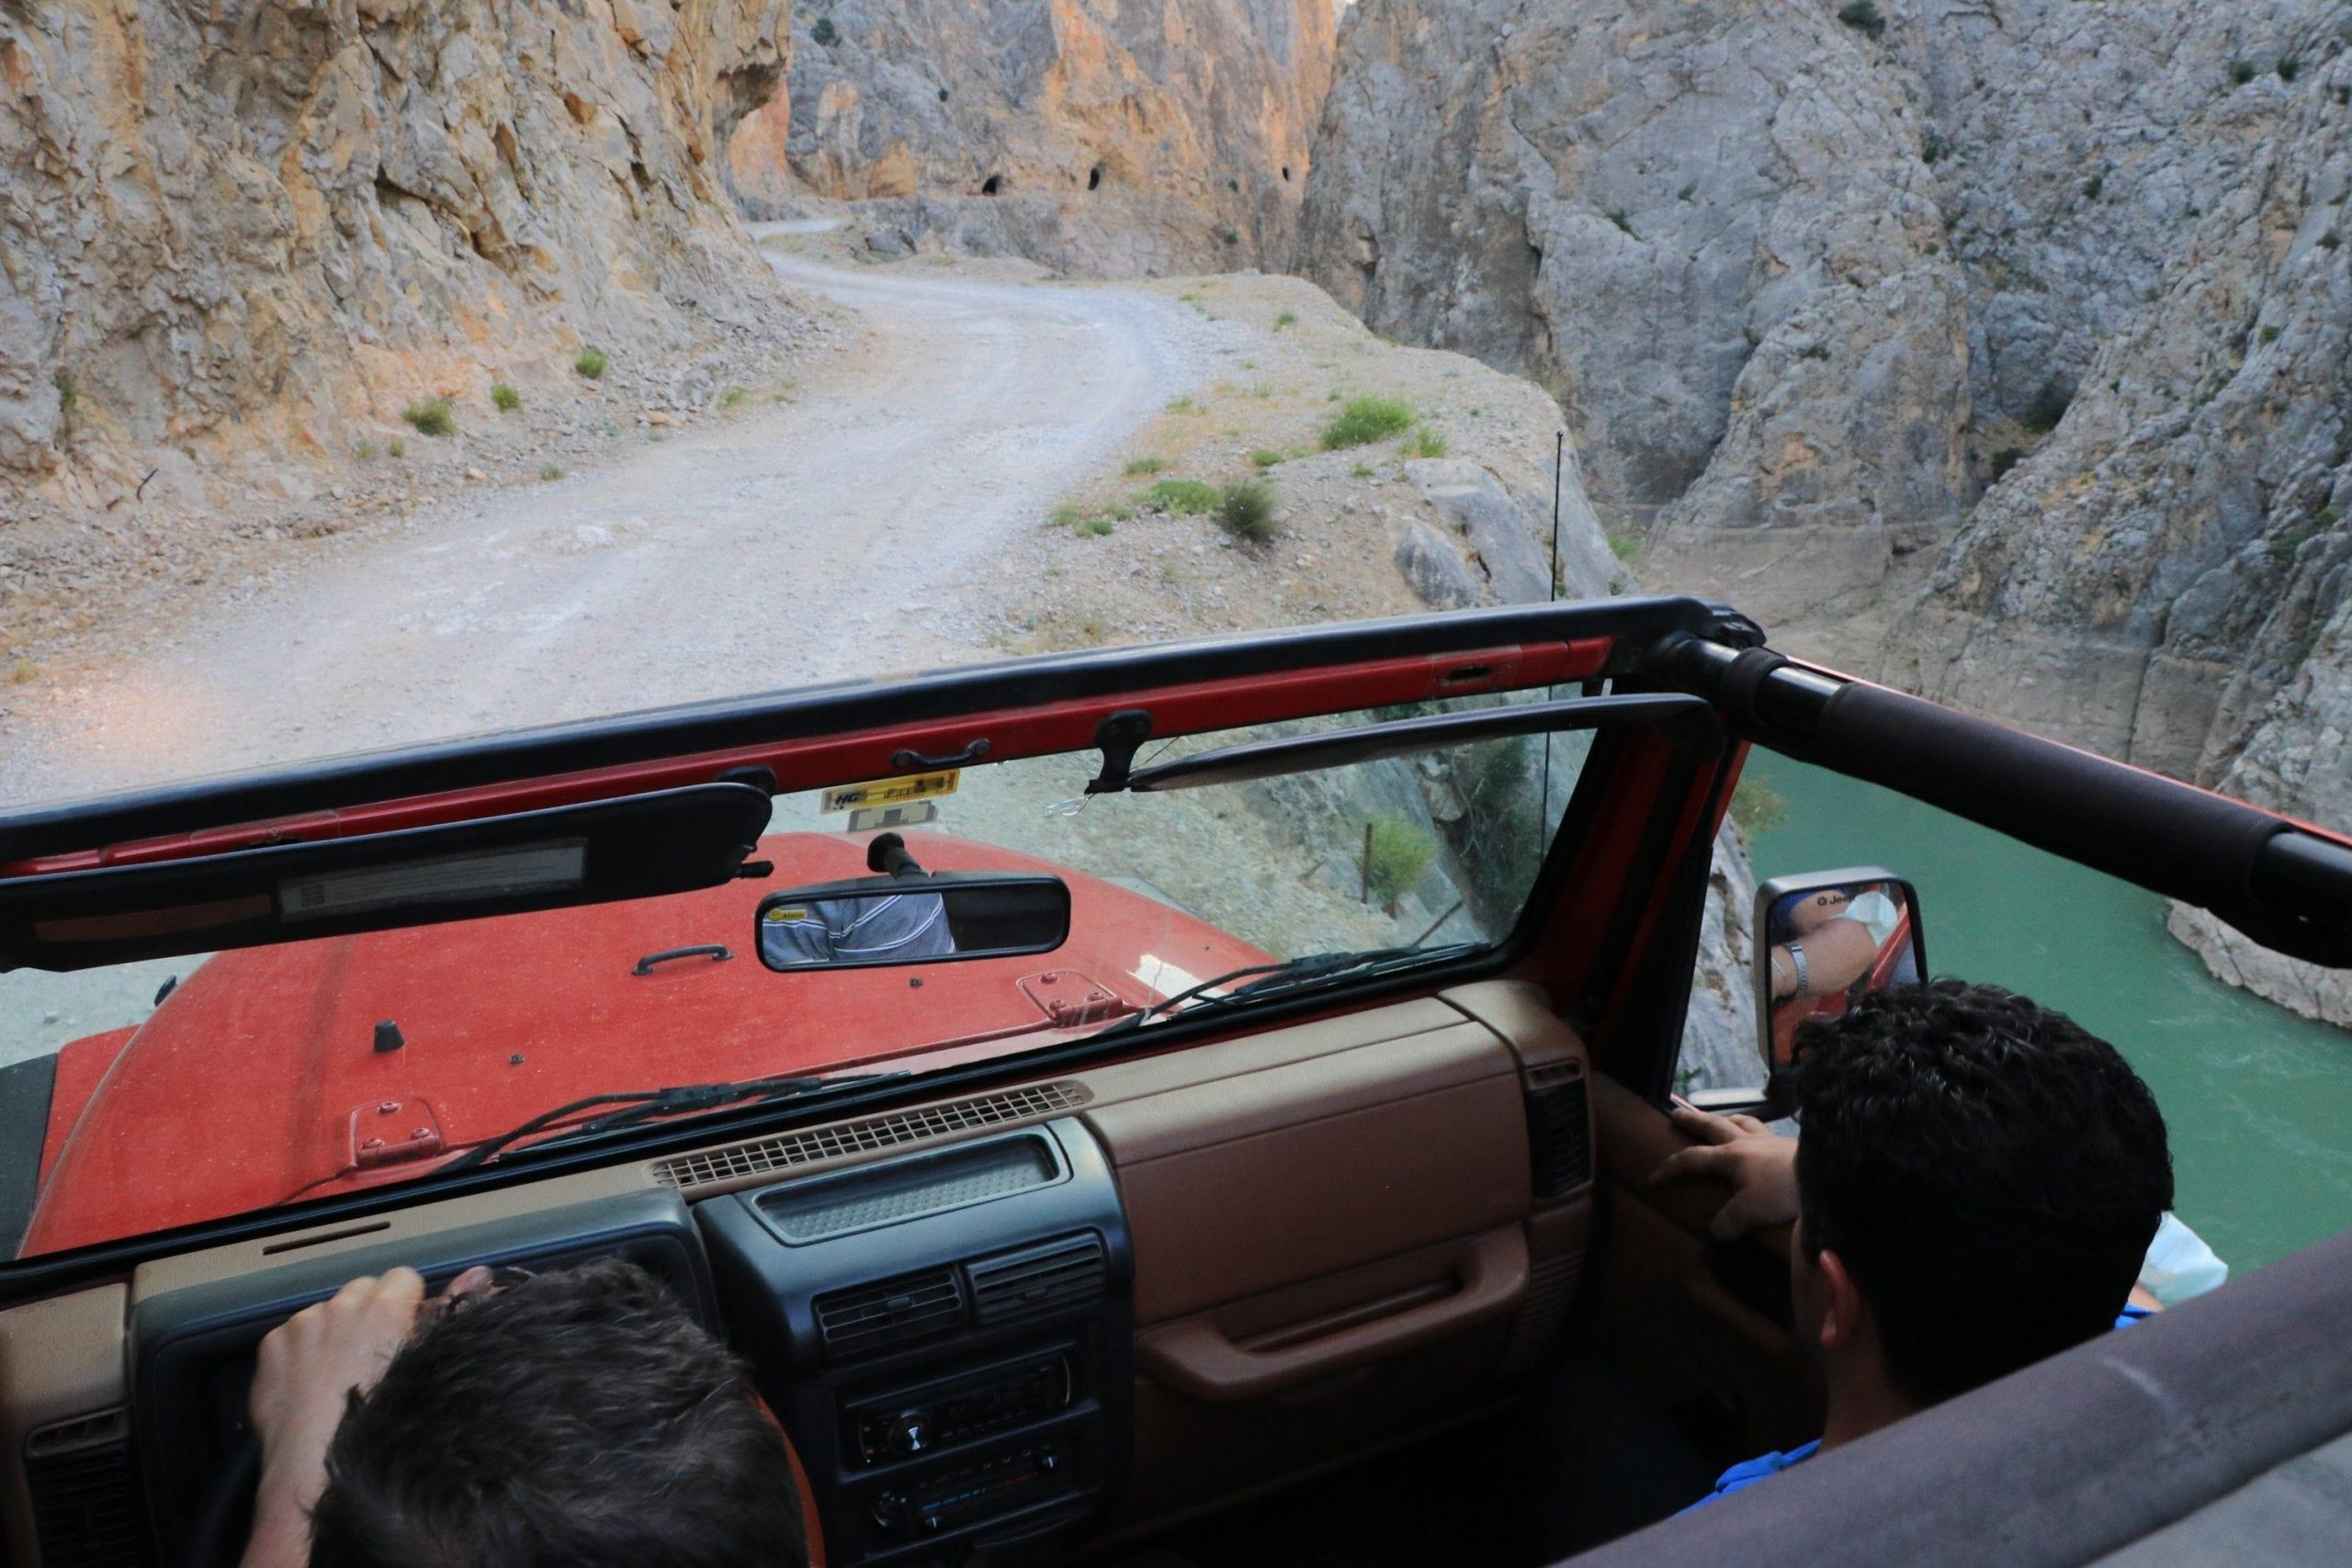 Thrill seekers flock to Turkey's Stone Road